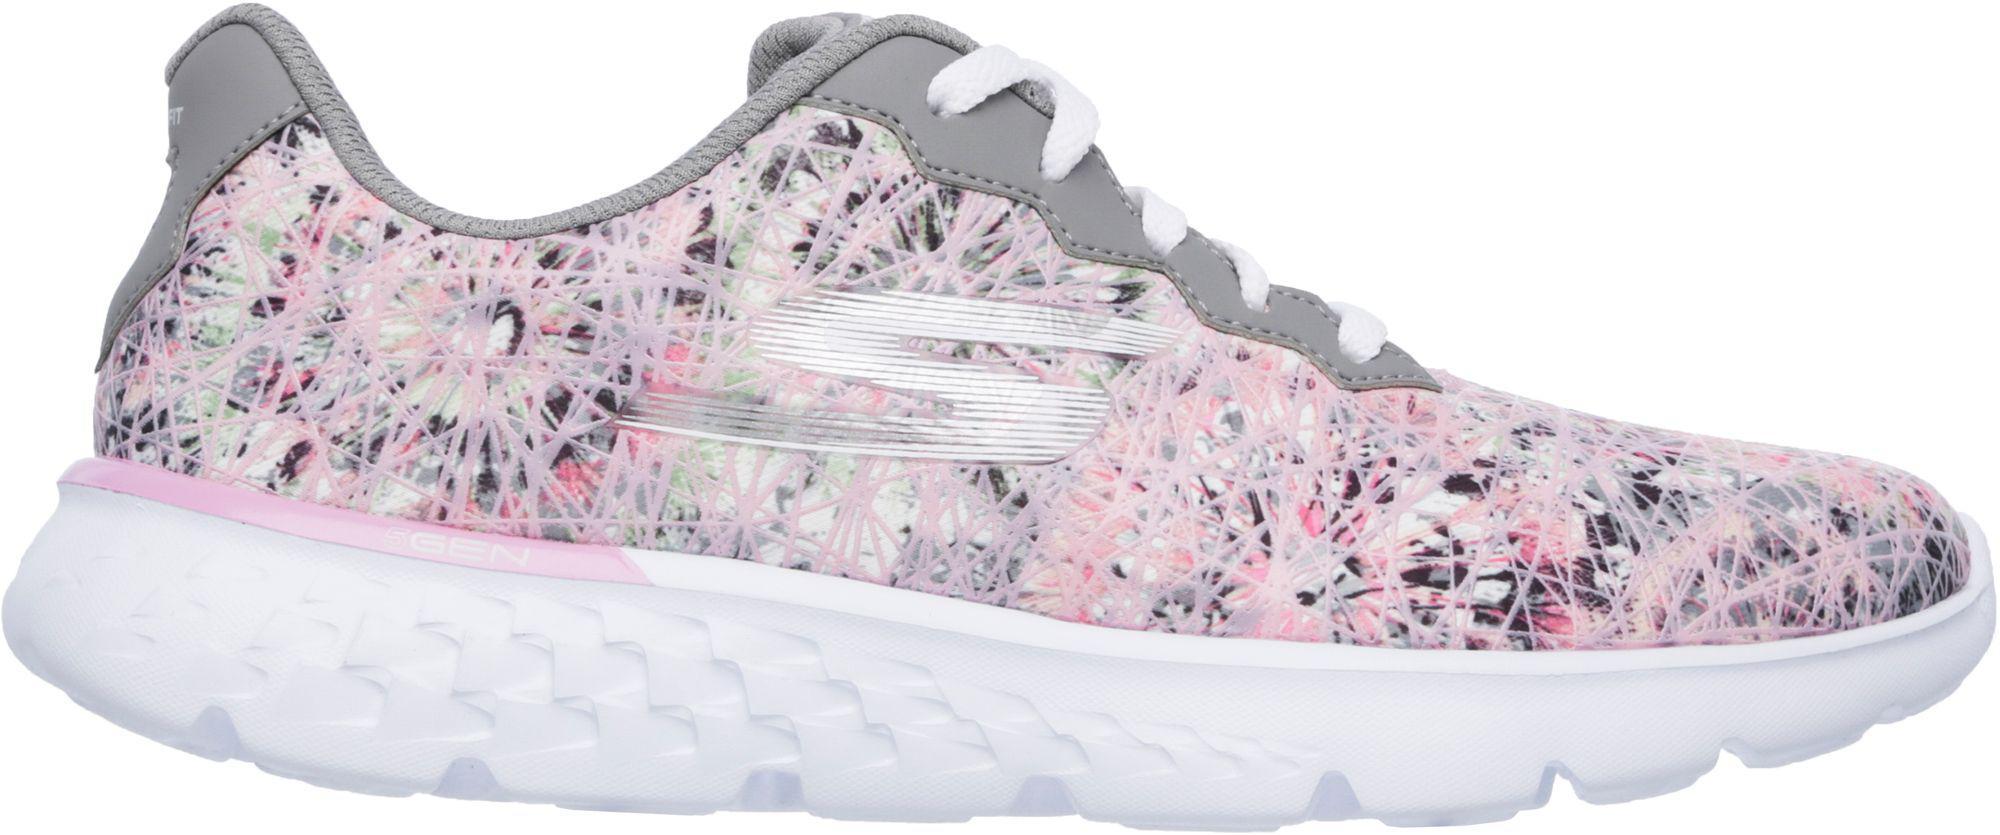 Running Shoes Skechers 400 Gray In Gorun Lyst qZFH6xAw